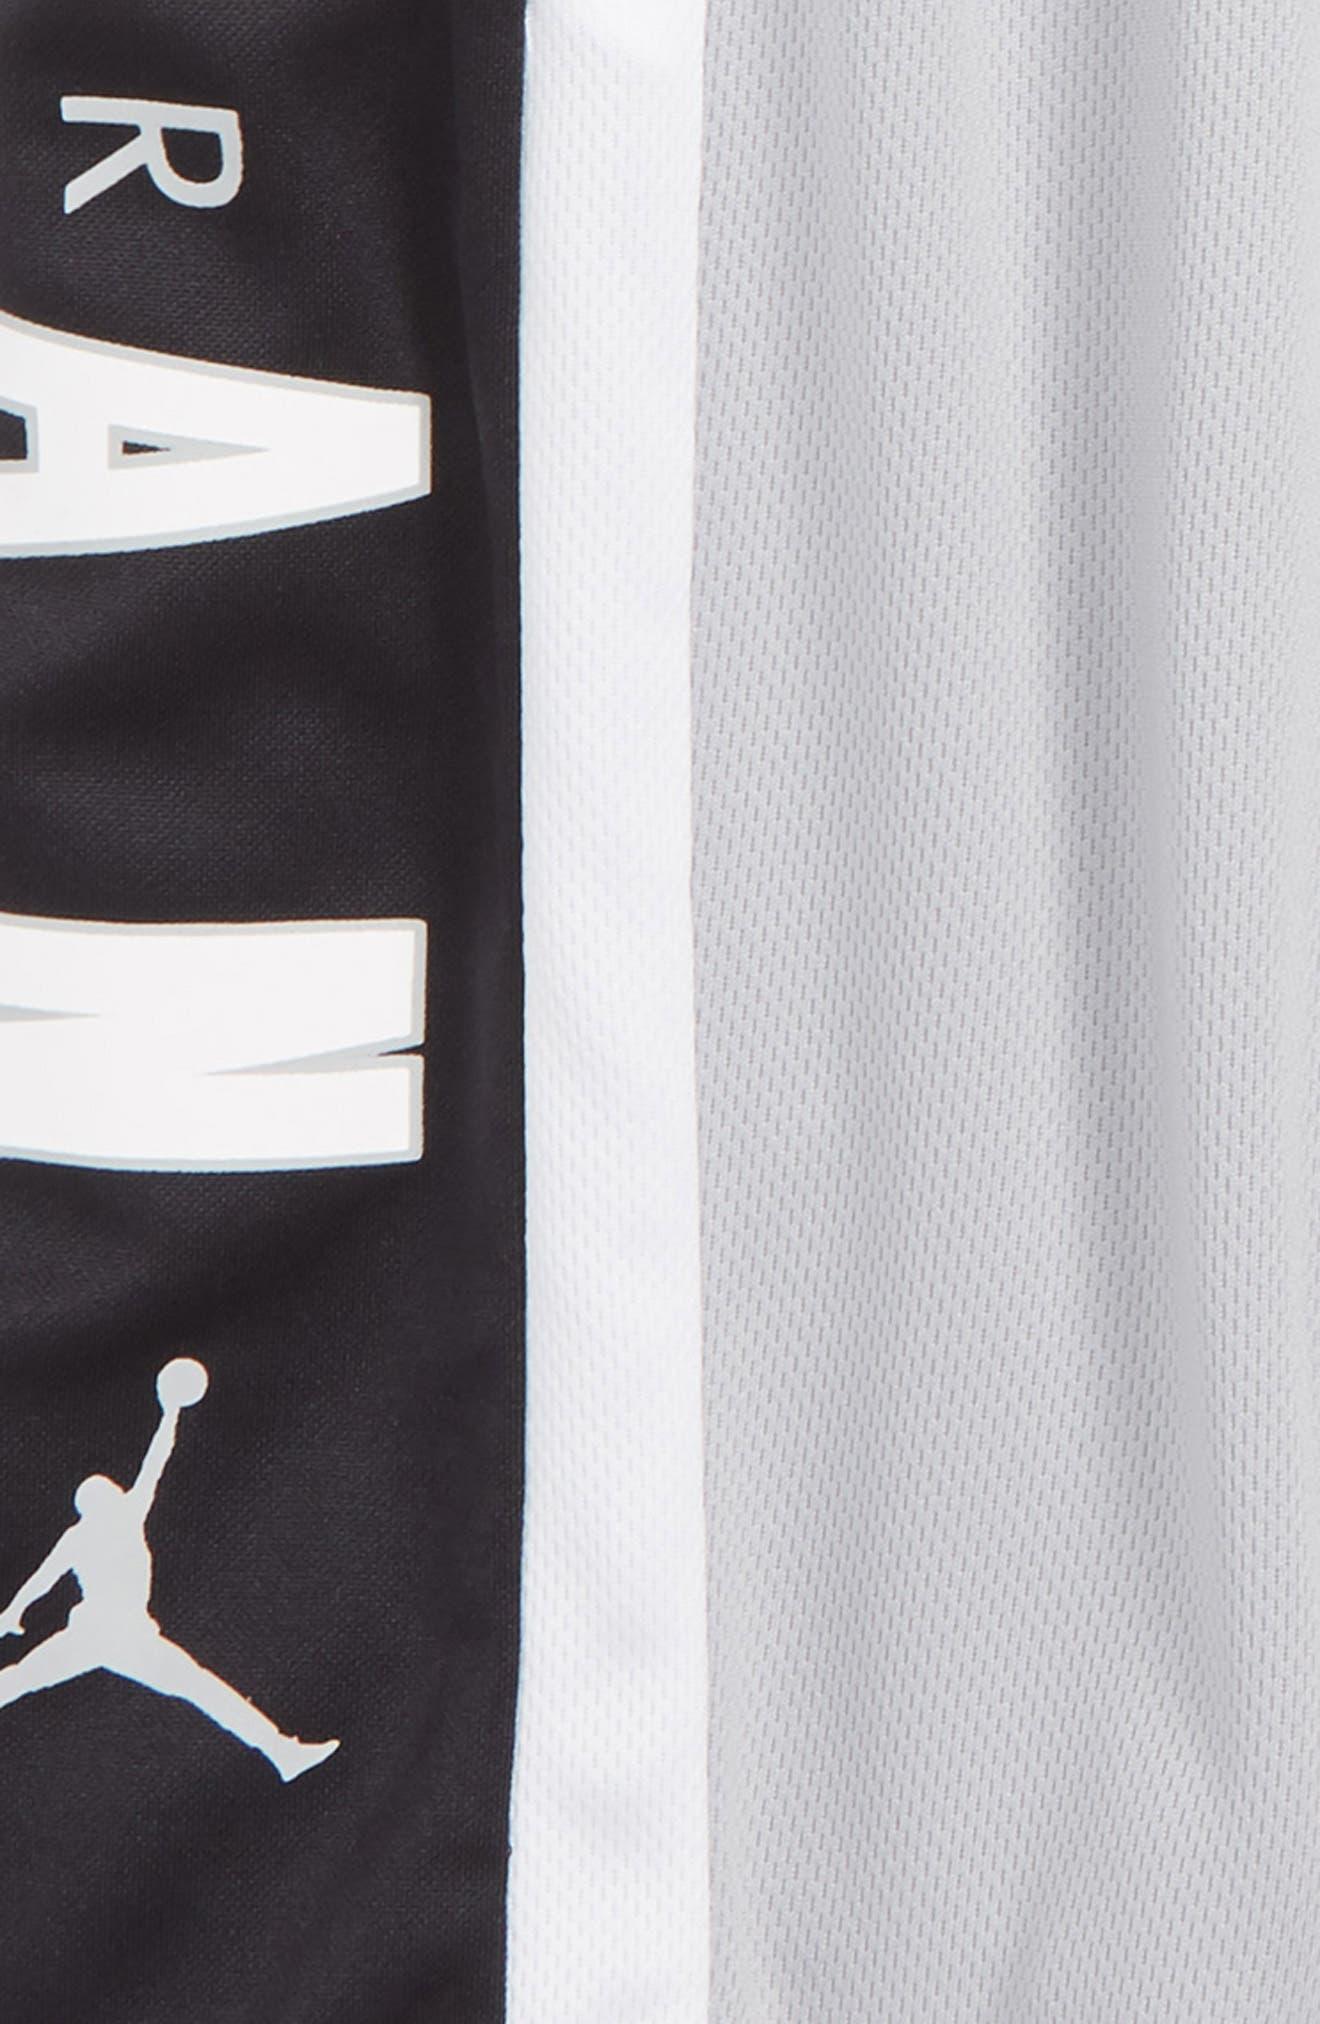 Rise3 Dri-FIT Basketball Shorts,                             Alternate thumbnail 2, color,                             LIGHT SMOKE GREY